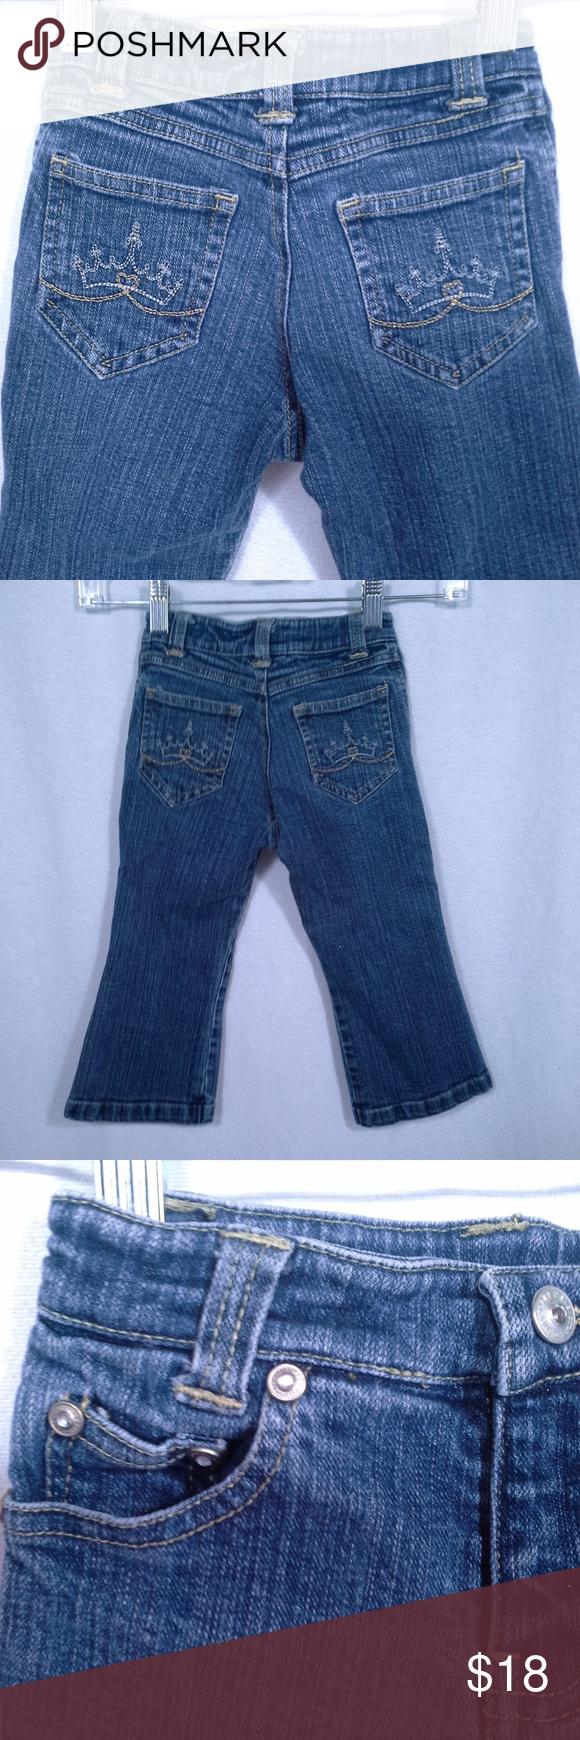 Disney Store jeans Size 3 Princess crown bling Clothes